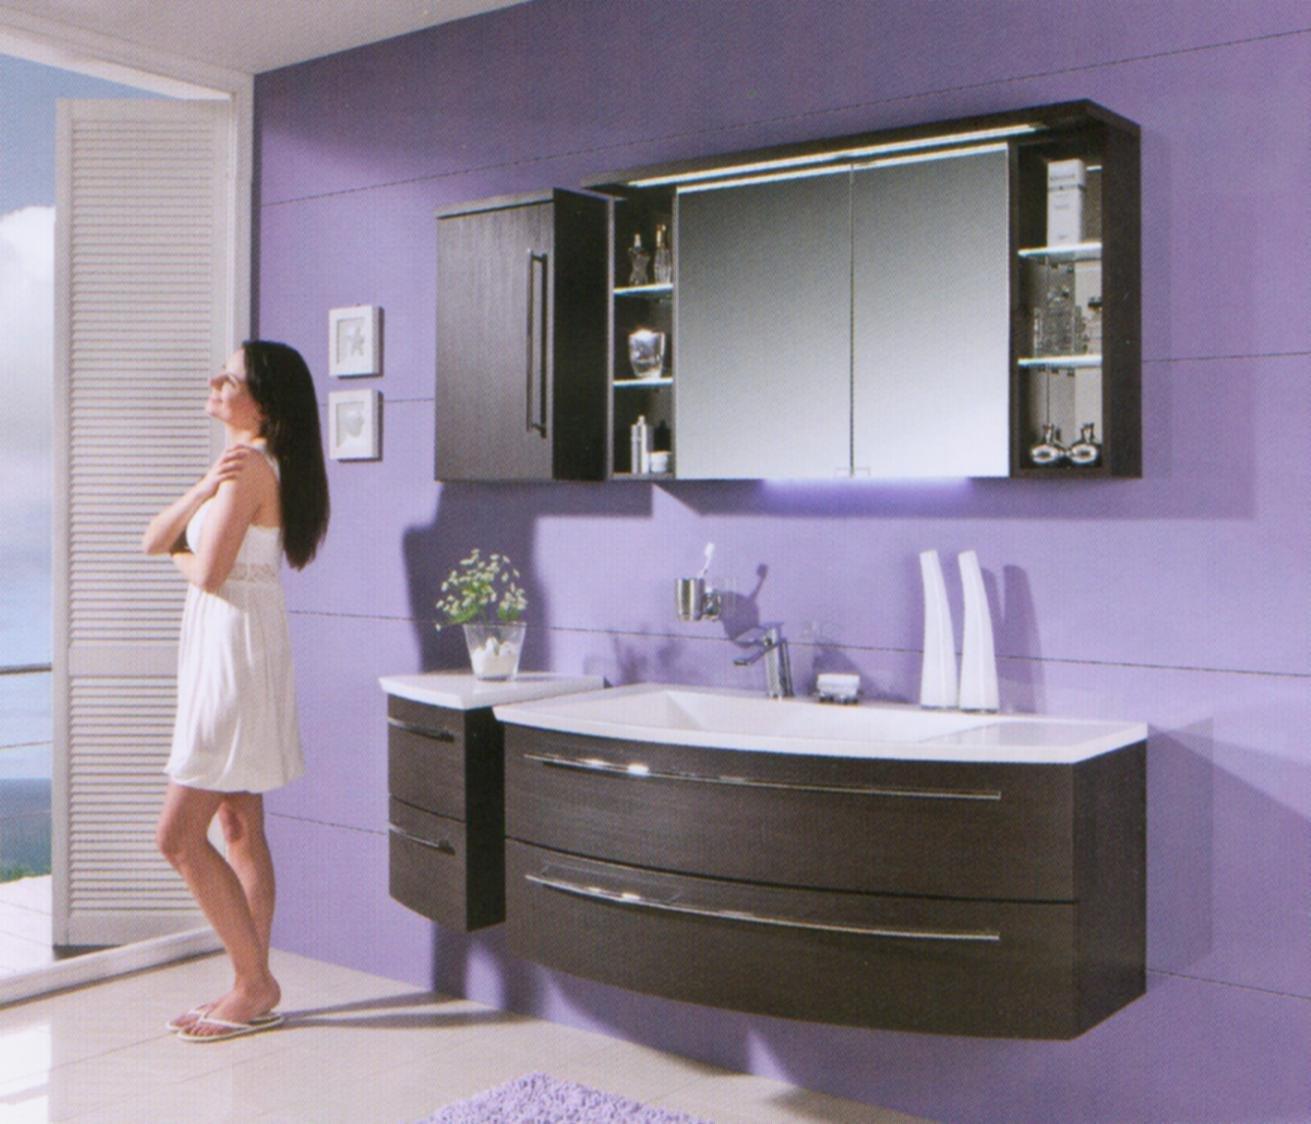 puris crescendo waschtischunterschrank 120 cm. Black Bedroom Furniture Sets. Home Design Ideas